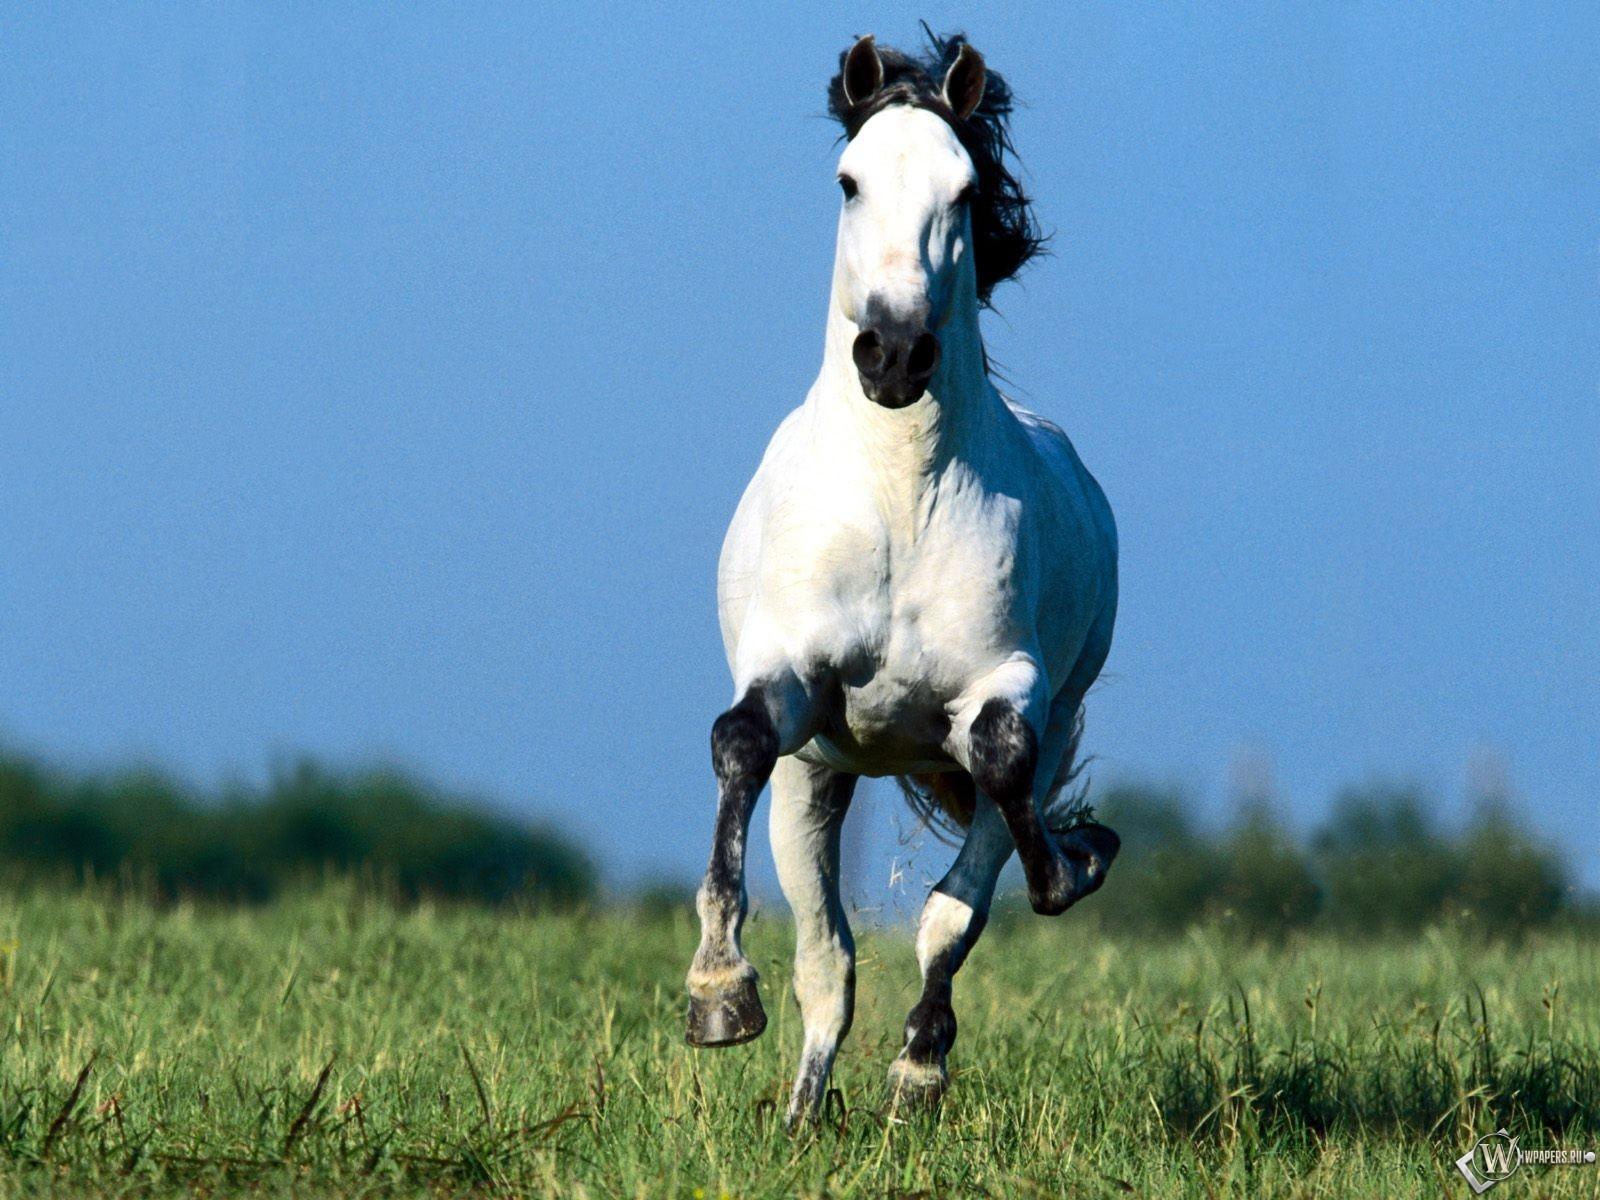 Белый бегущий конь 1600x1200